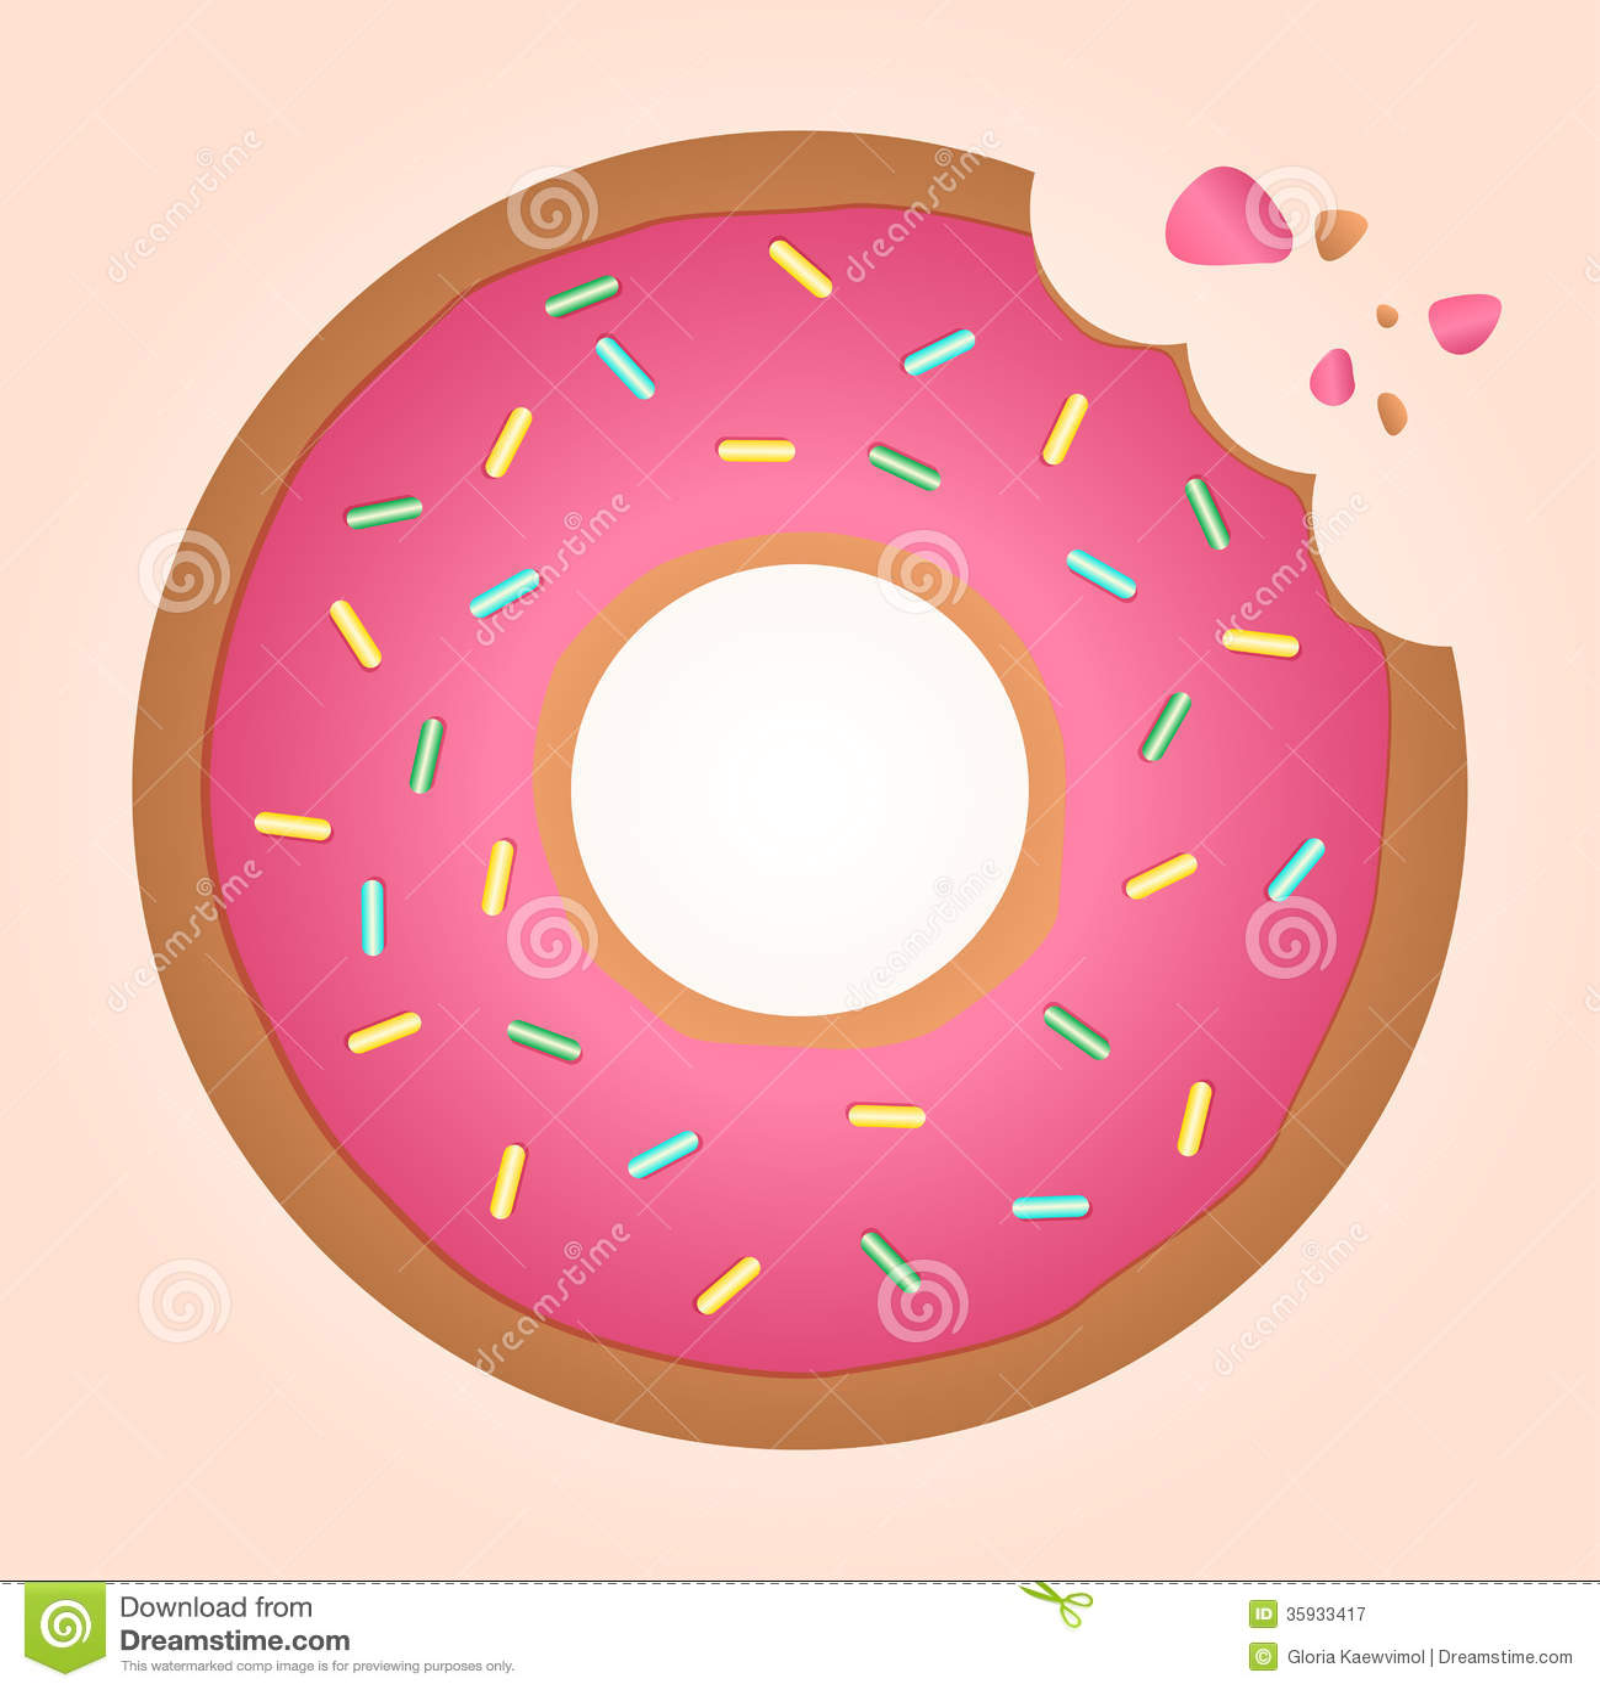 Doughnut Ring doughnut royalty free